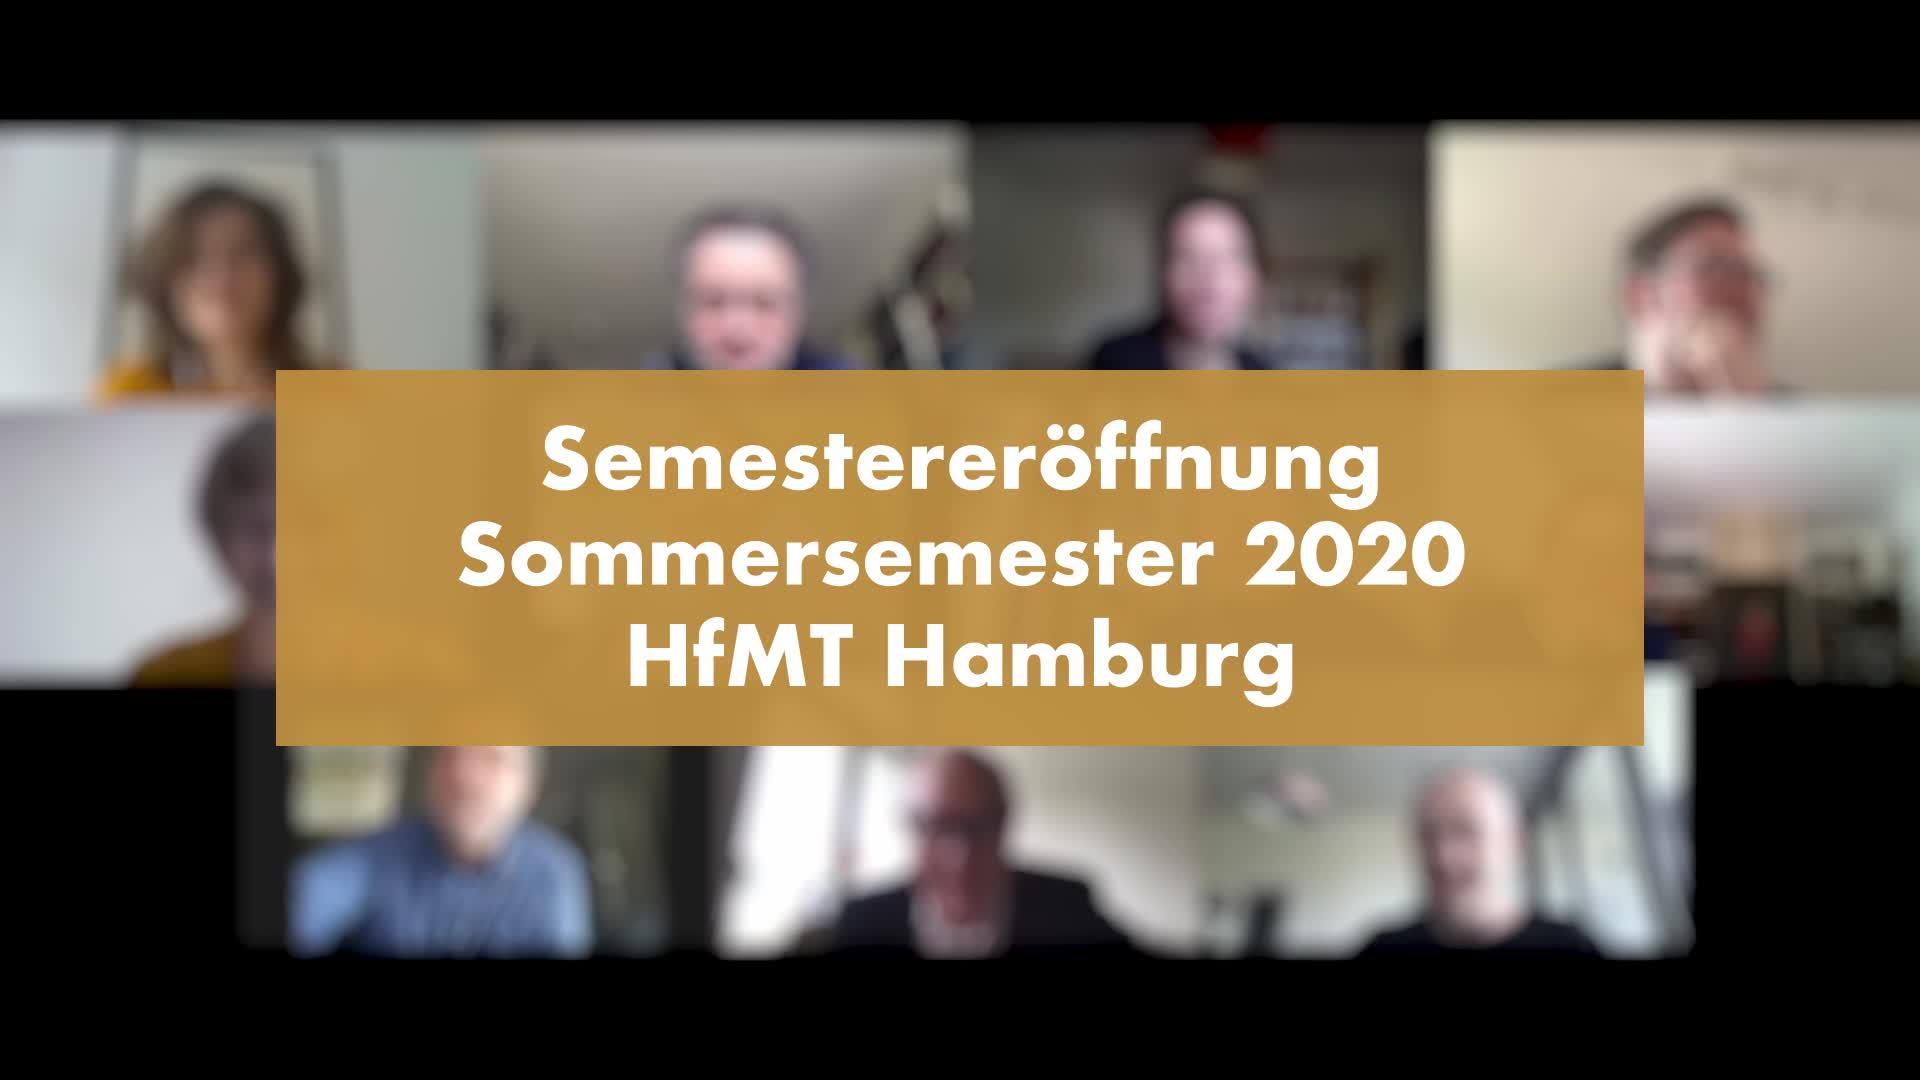 Thumbnail - Online-Semestereröffnung - Sommersemester 2020